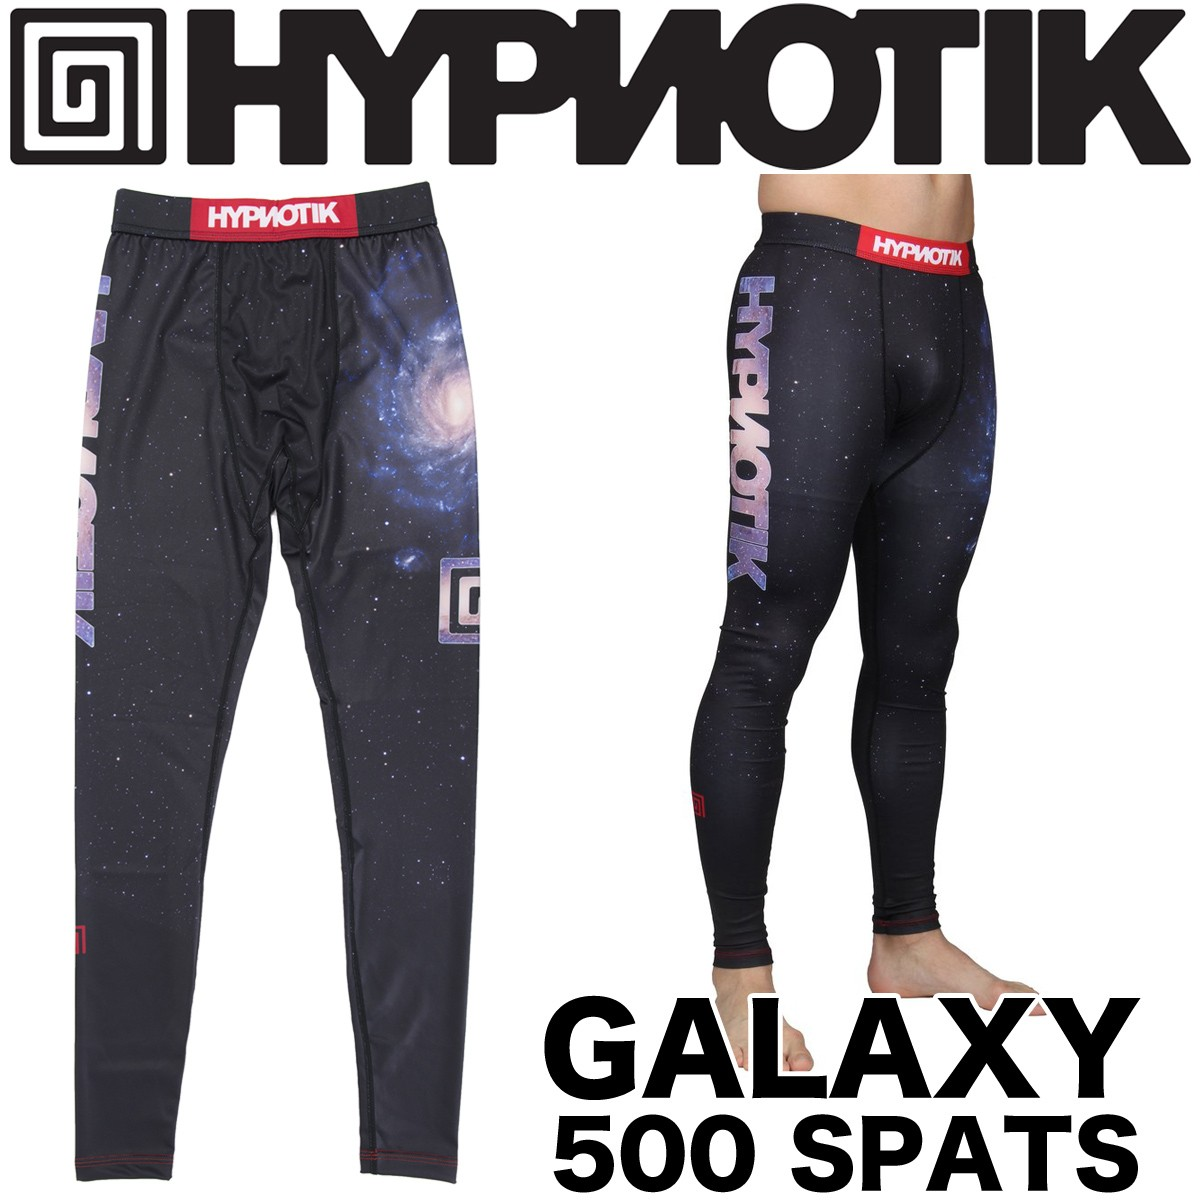 HYPNOTIK GALAXY 500 SPATS